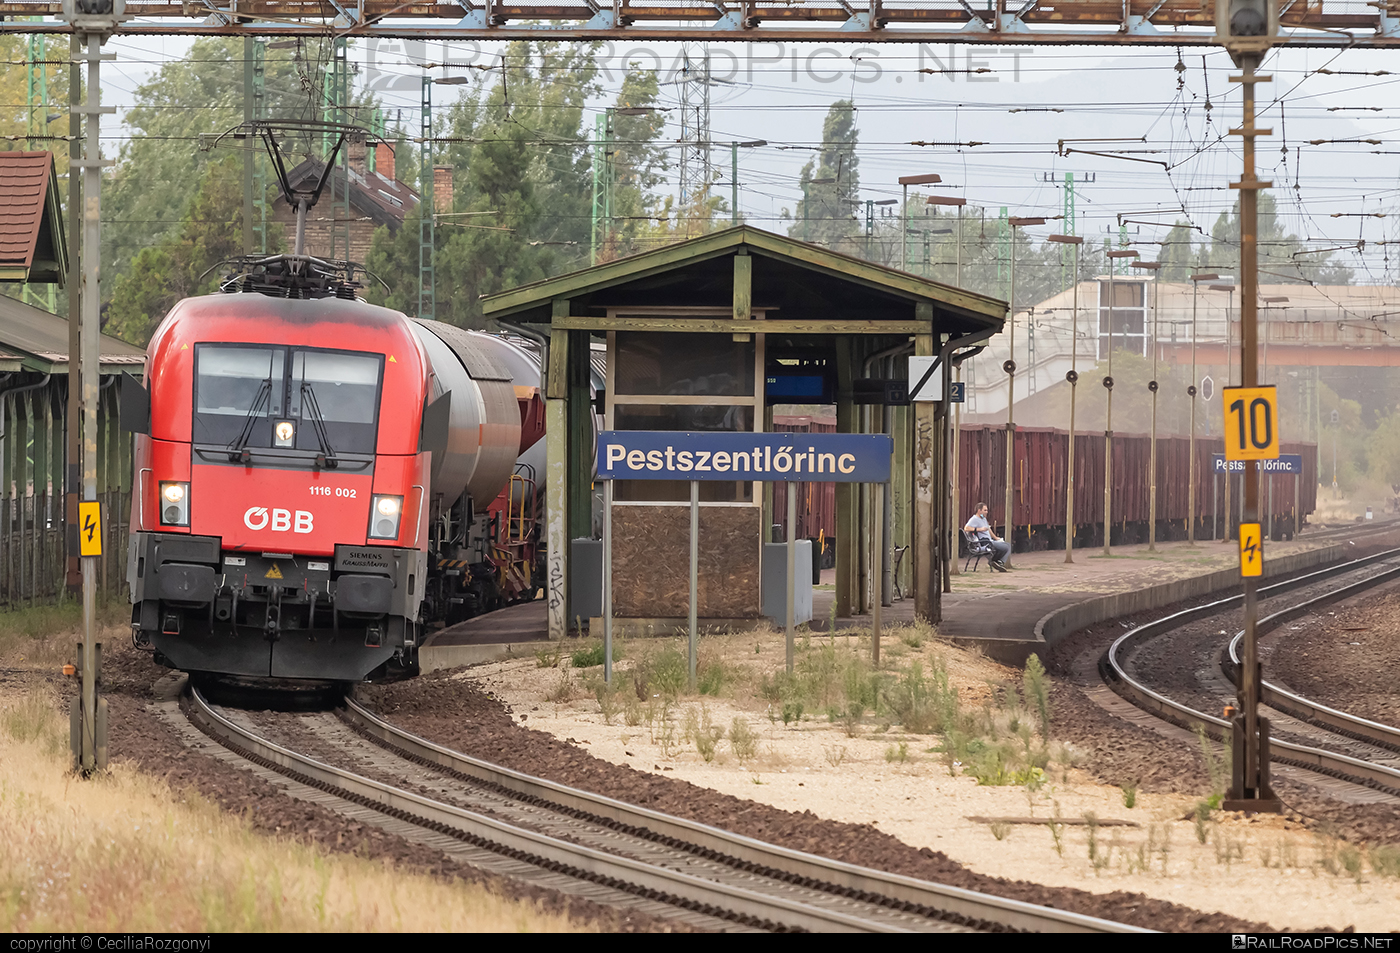 Siemens ES 64 U2 - 1116 002 operated by Rail Cargo Hungaria ZRt. #es64 #es64u #es64u2 #eurosprinter #obb #osterreichischebundesbahnen #siemens #siemenses64 #siemenses64u #siemenses64u2 #siemenstaurus #tauruslocomotive